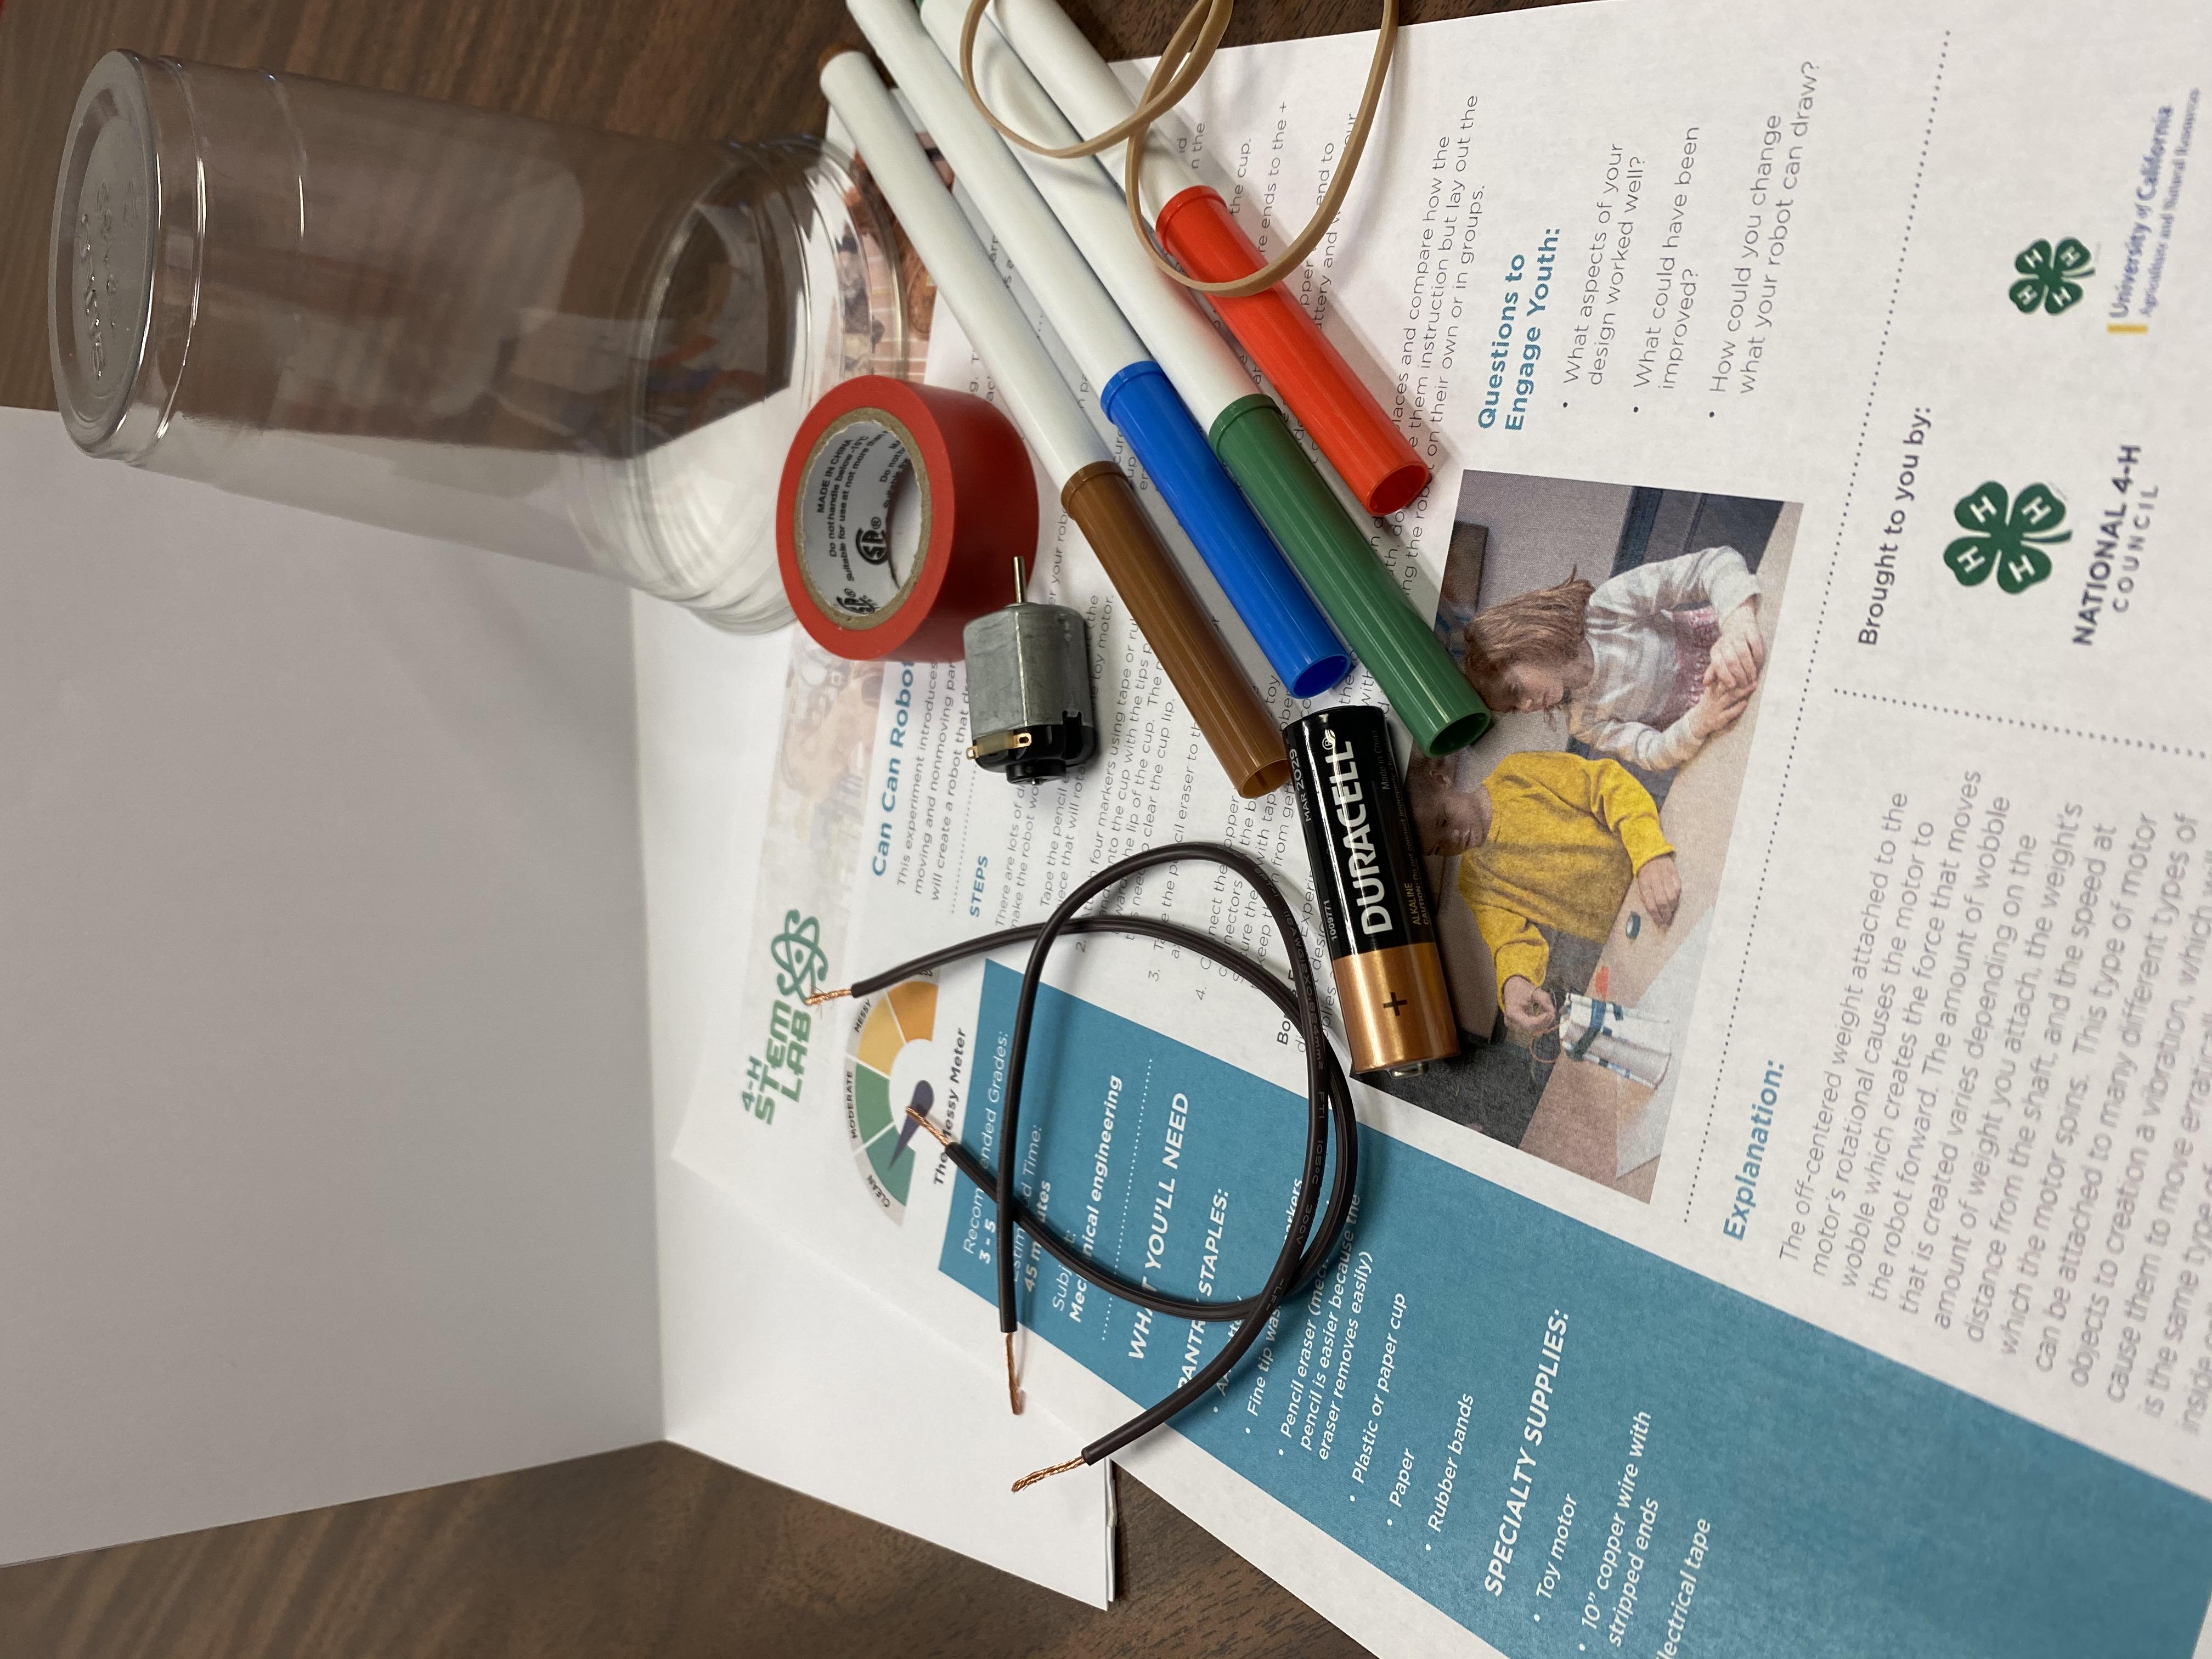 Winter 4-H Activity Kit